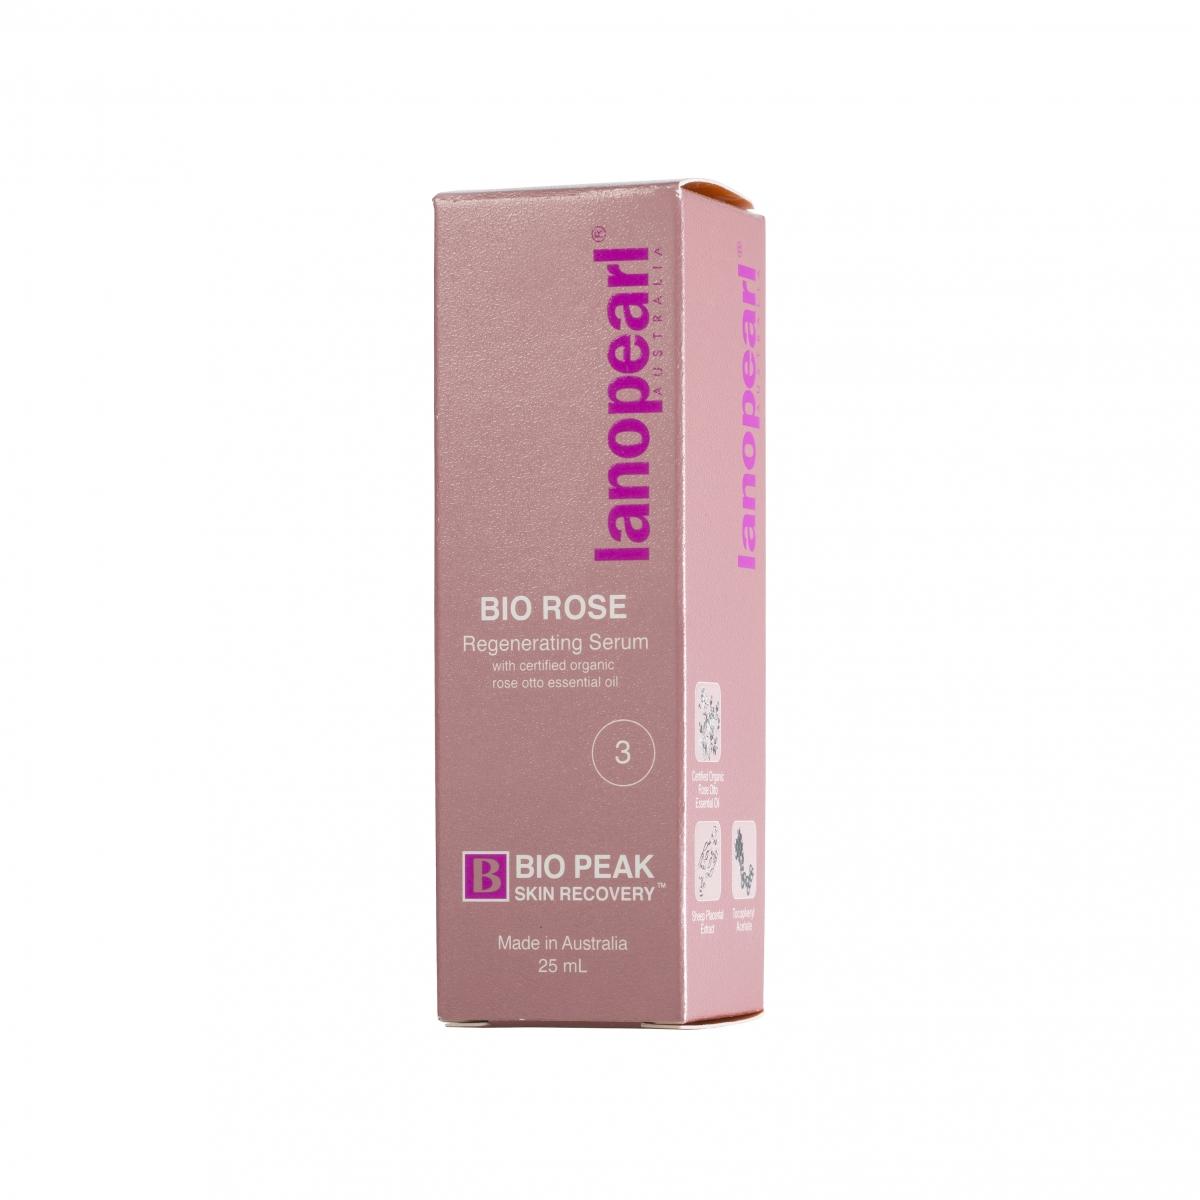 Bio Rose™ Regenerating Serum 玫瑰活膚精華液 25mL